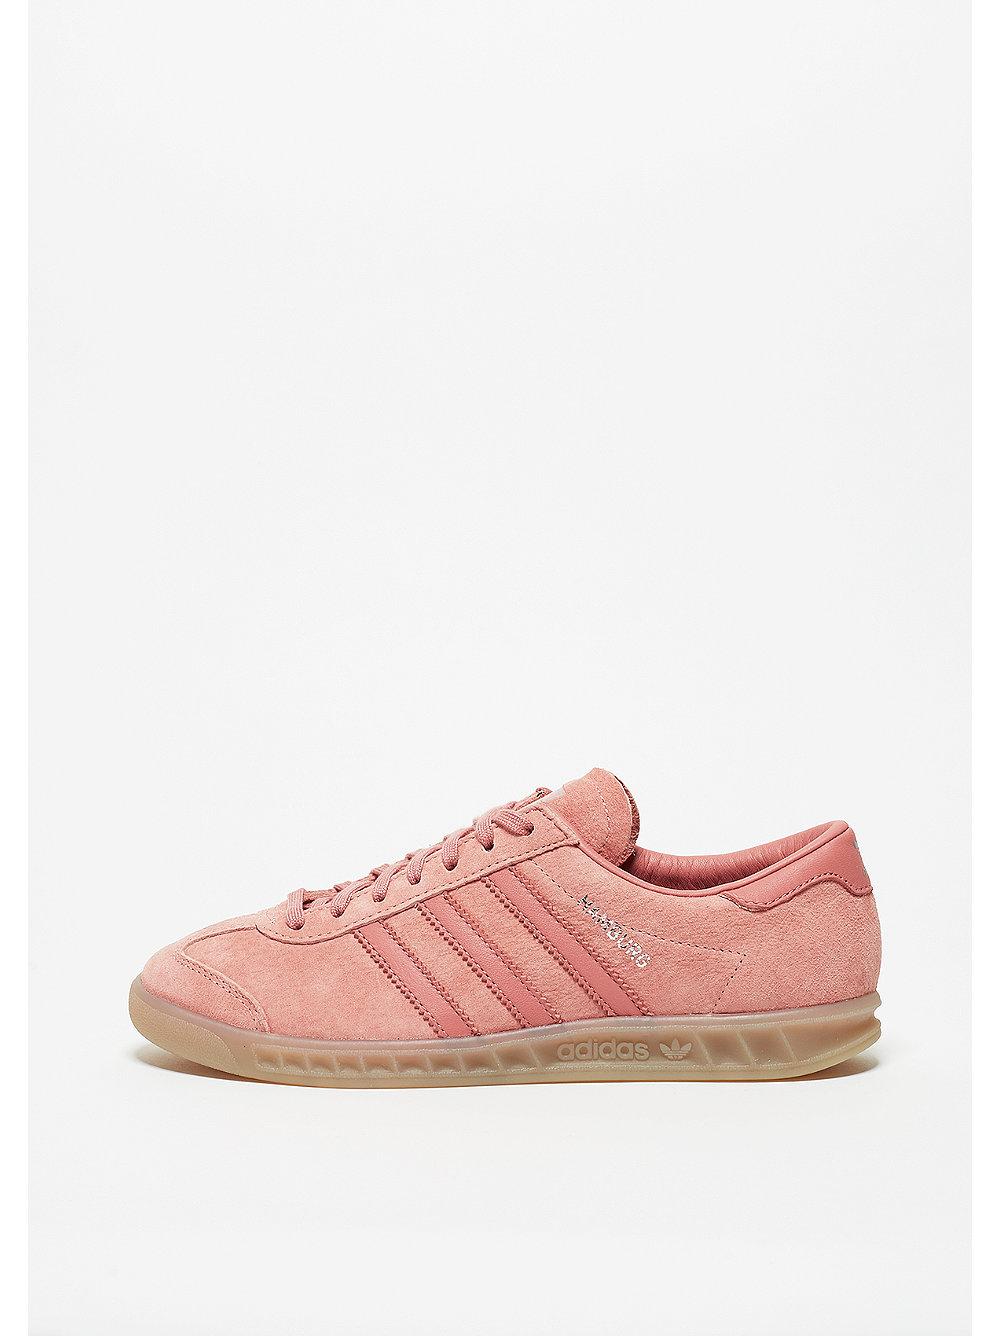 adidas Hamburg raw pink-raw pink-gum